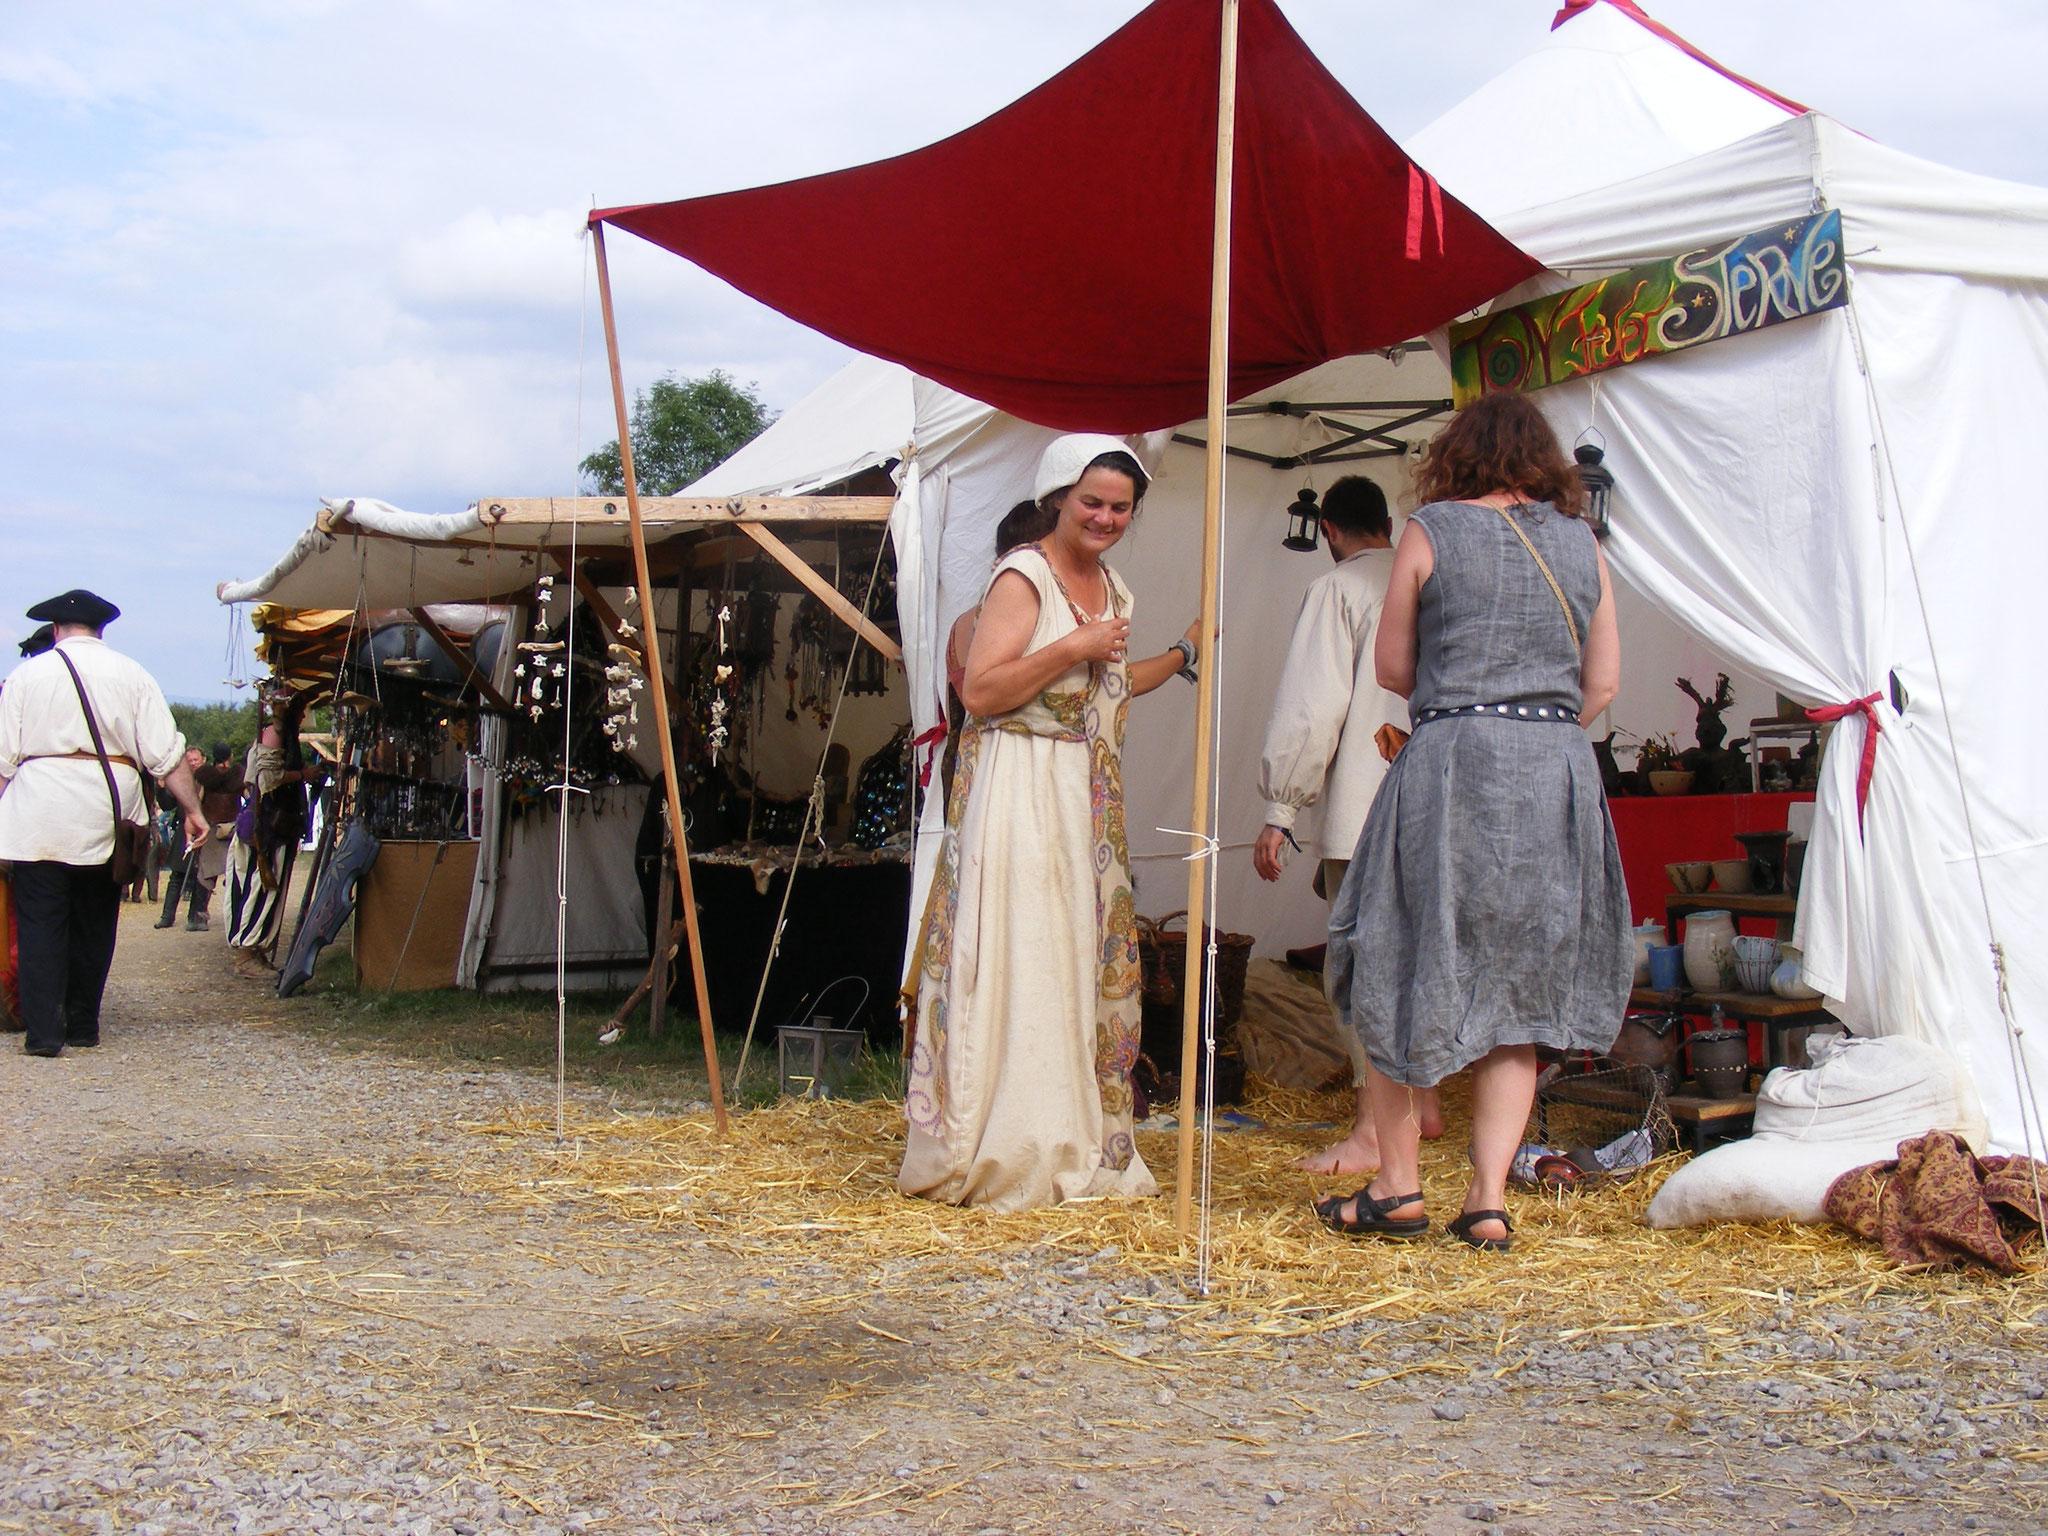 Mütterchen Matsch im Töpferzelt, Drachenfest 2016